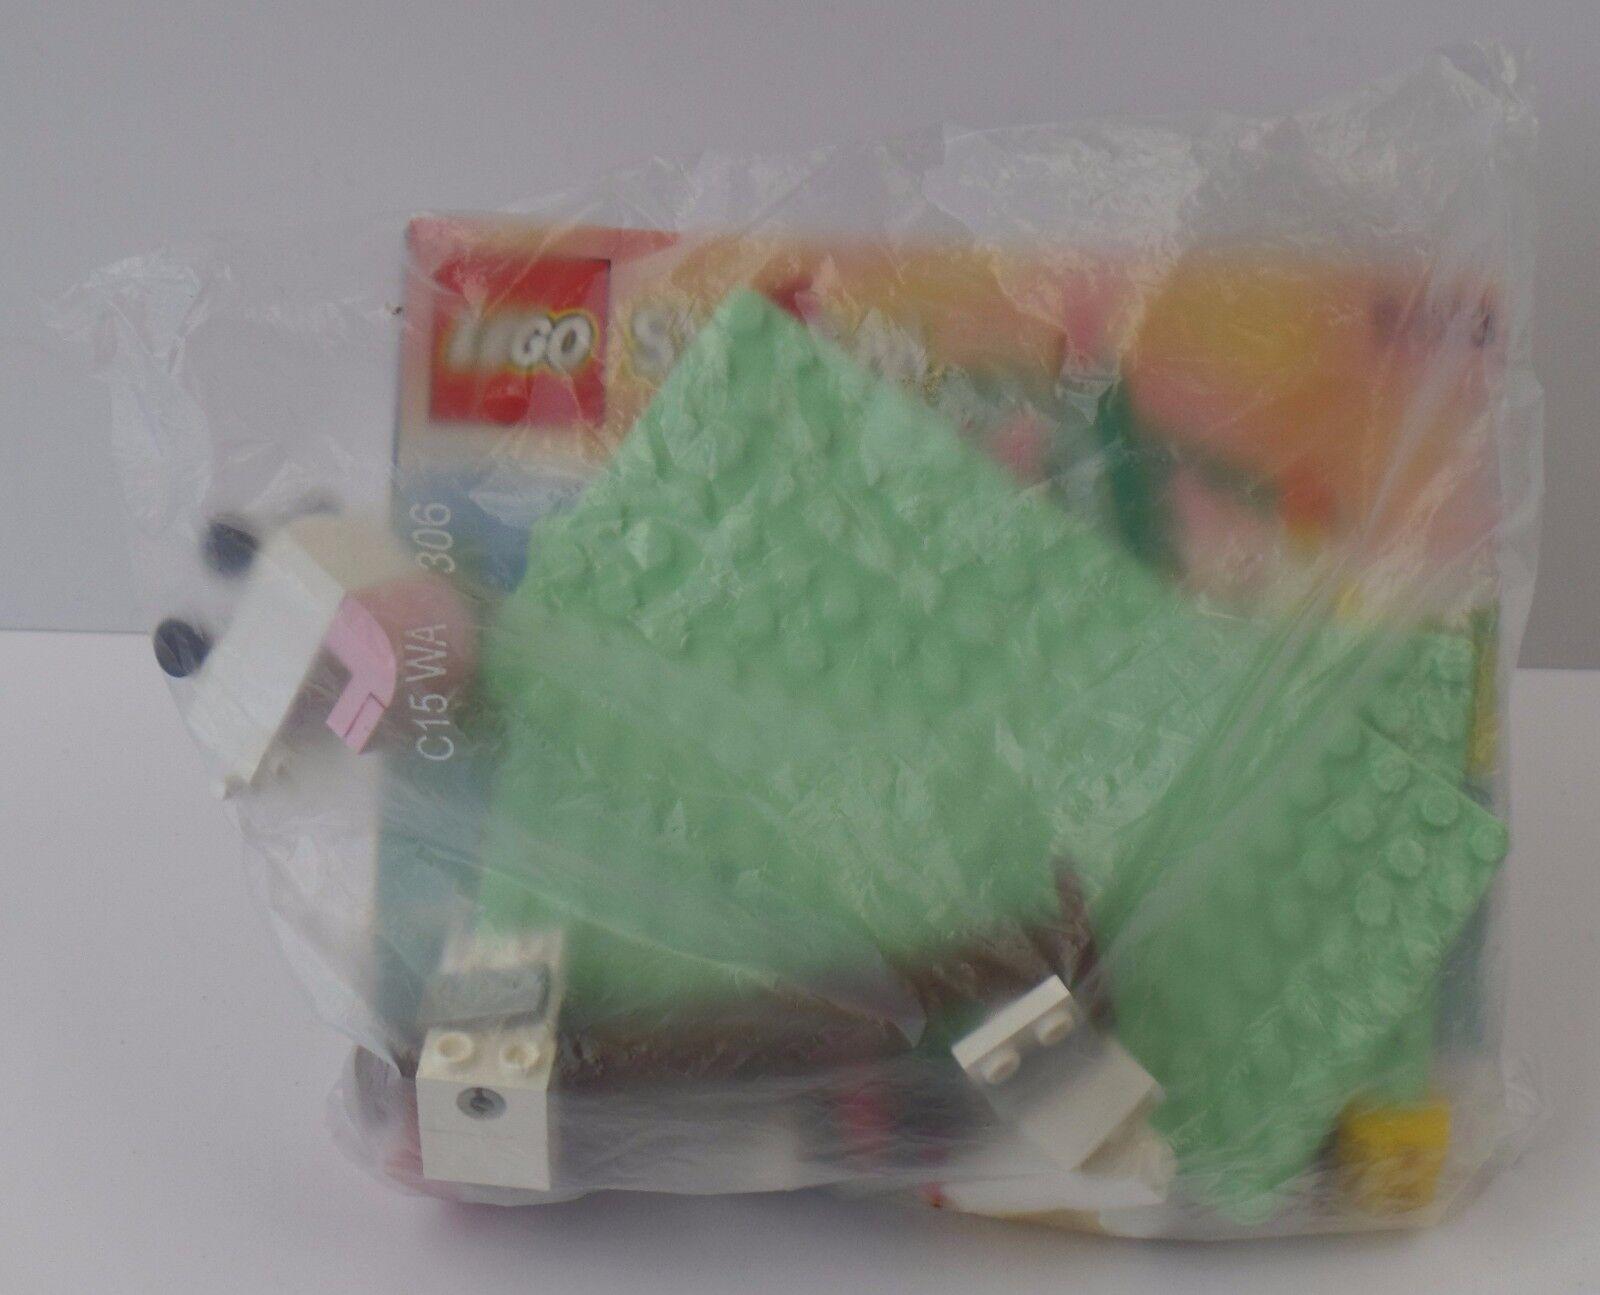 Lego System Paradisa Spielplatz 6403 6403 6403 - NEU NEW c75fcb